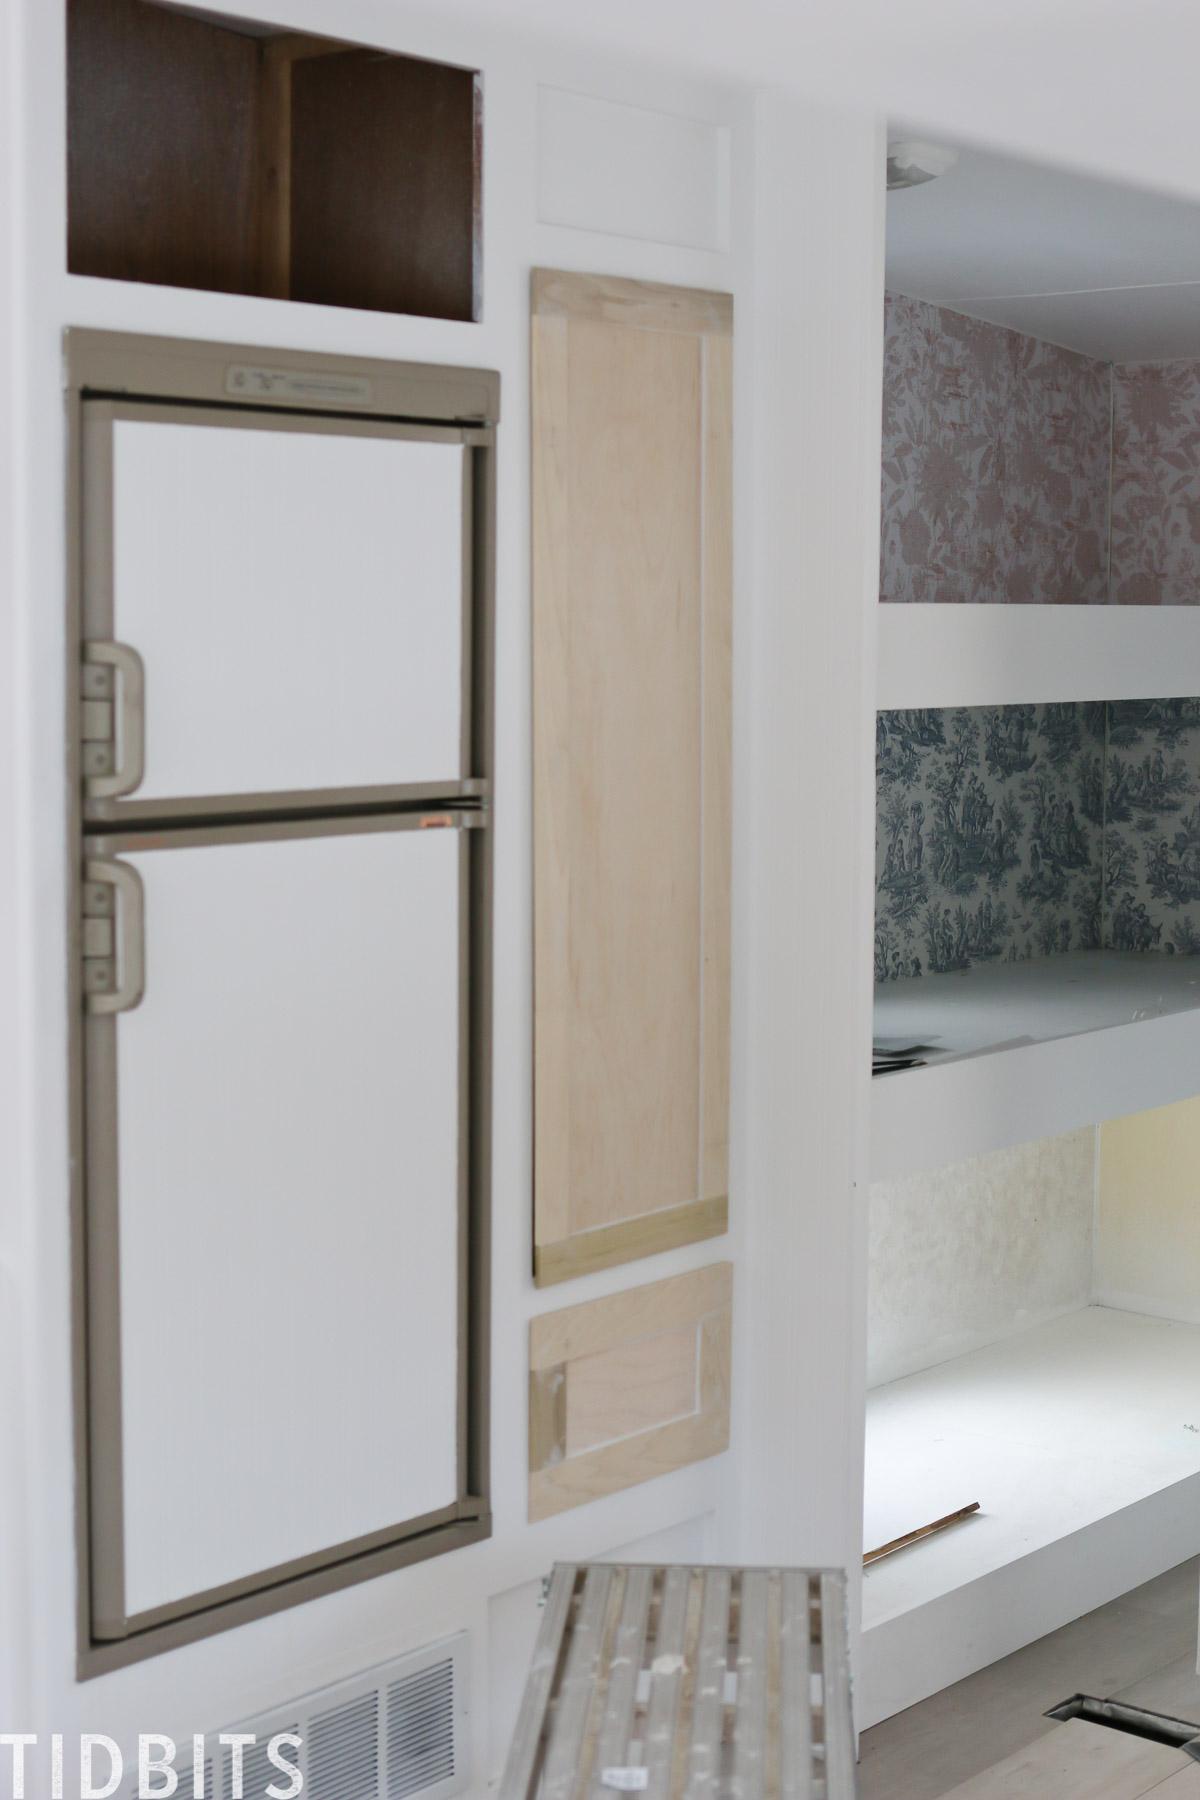 RV kitchen fridge covered in wallpaper